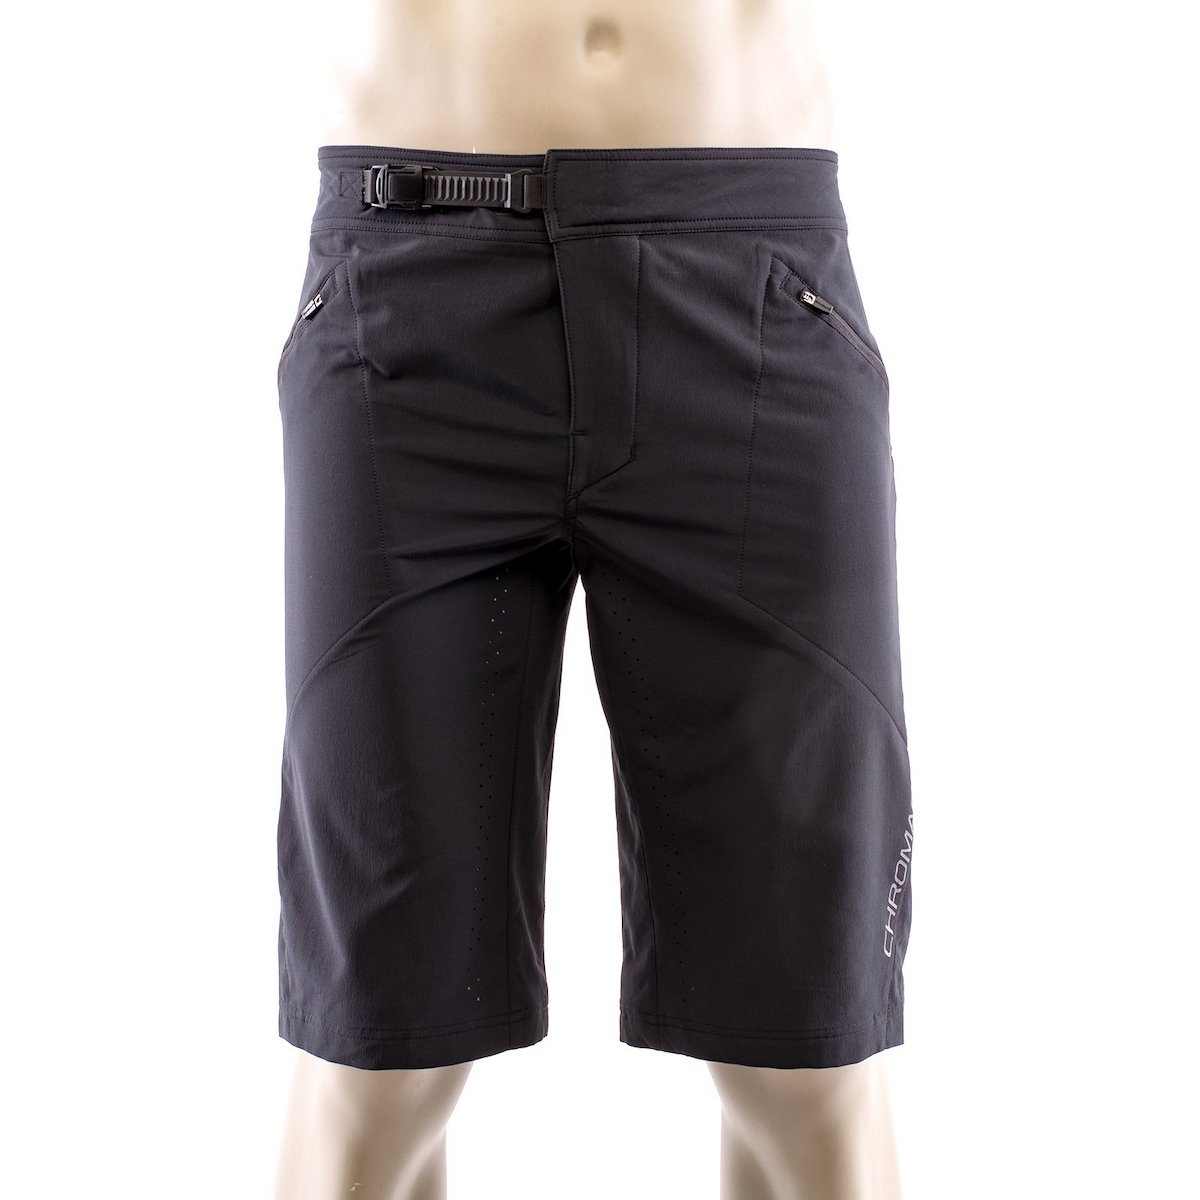 Shorts Ambit Black